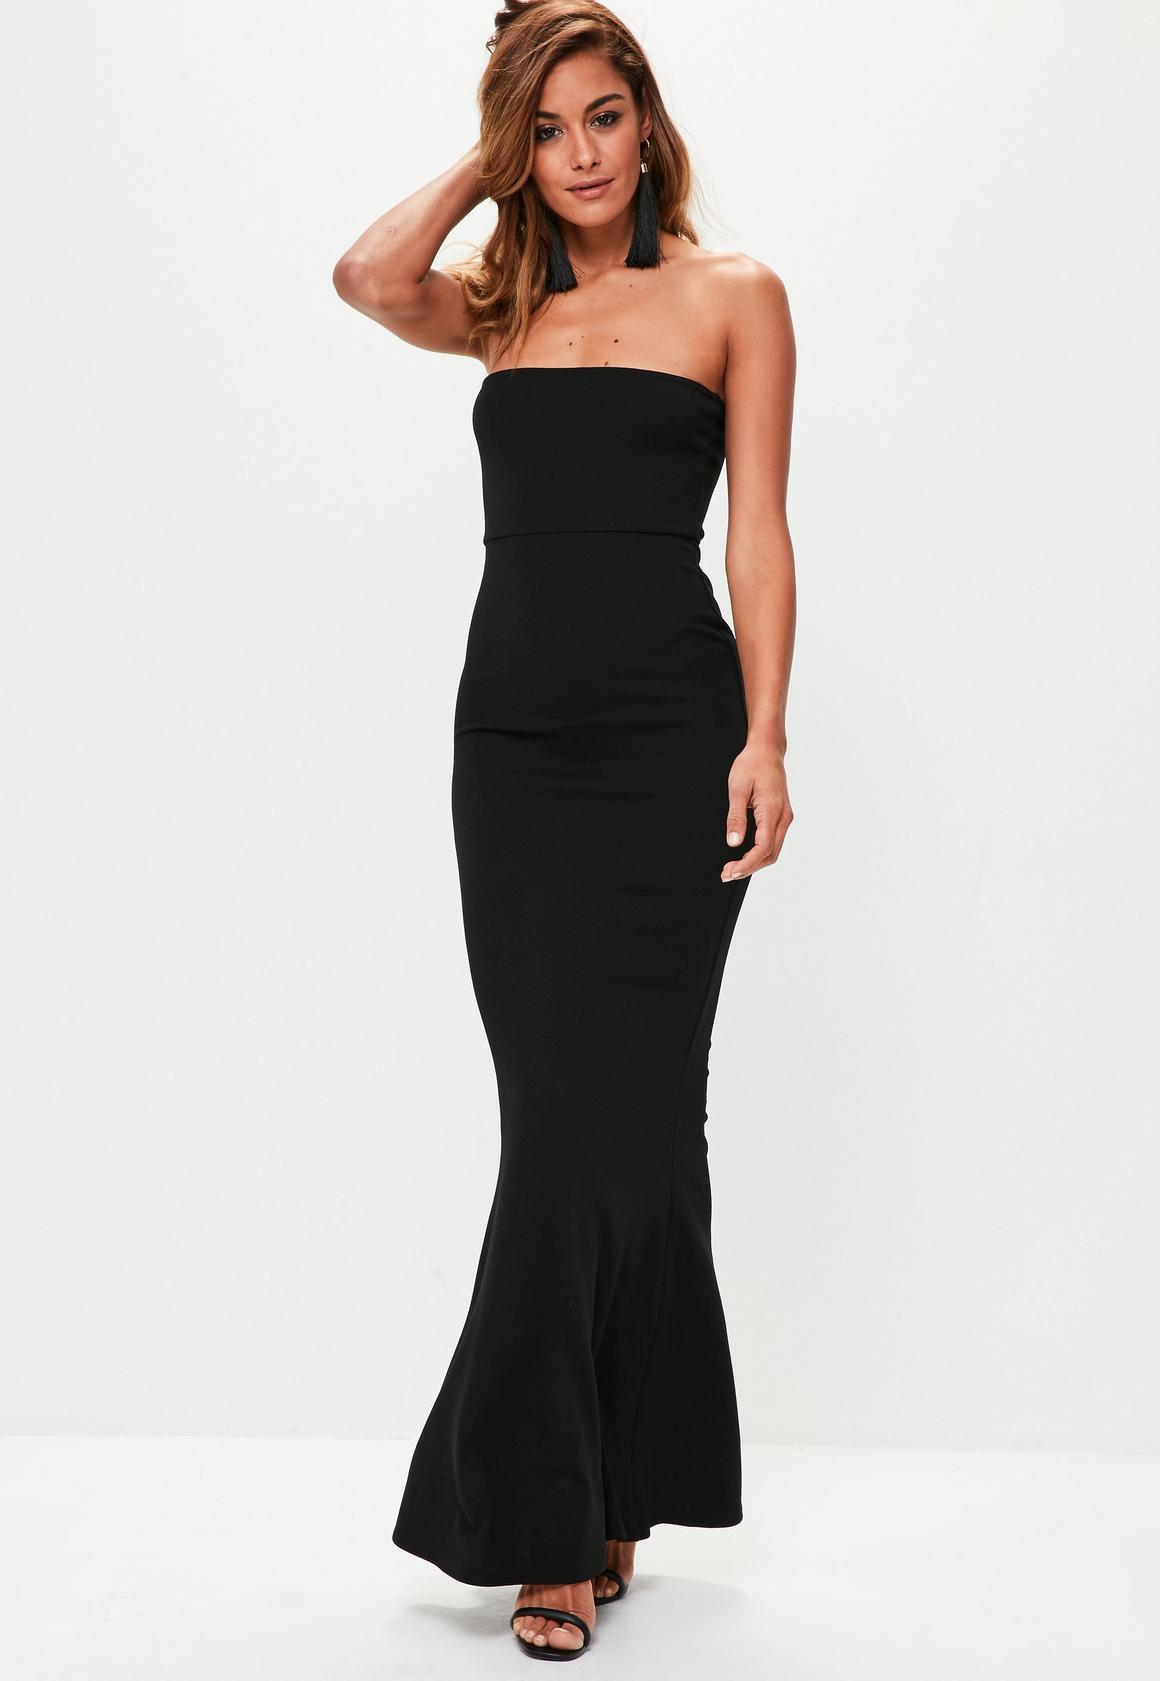 13a7382ebad Black Crepe Sleeveless Maxi Dress. Previous Next